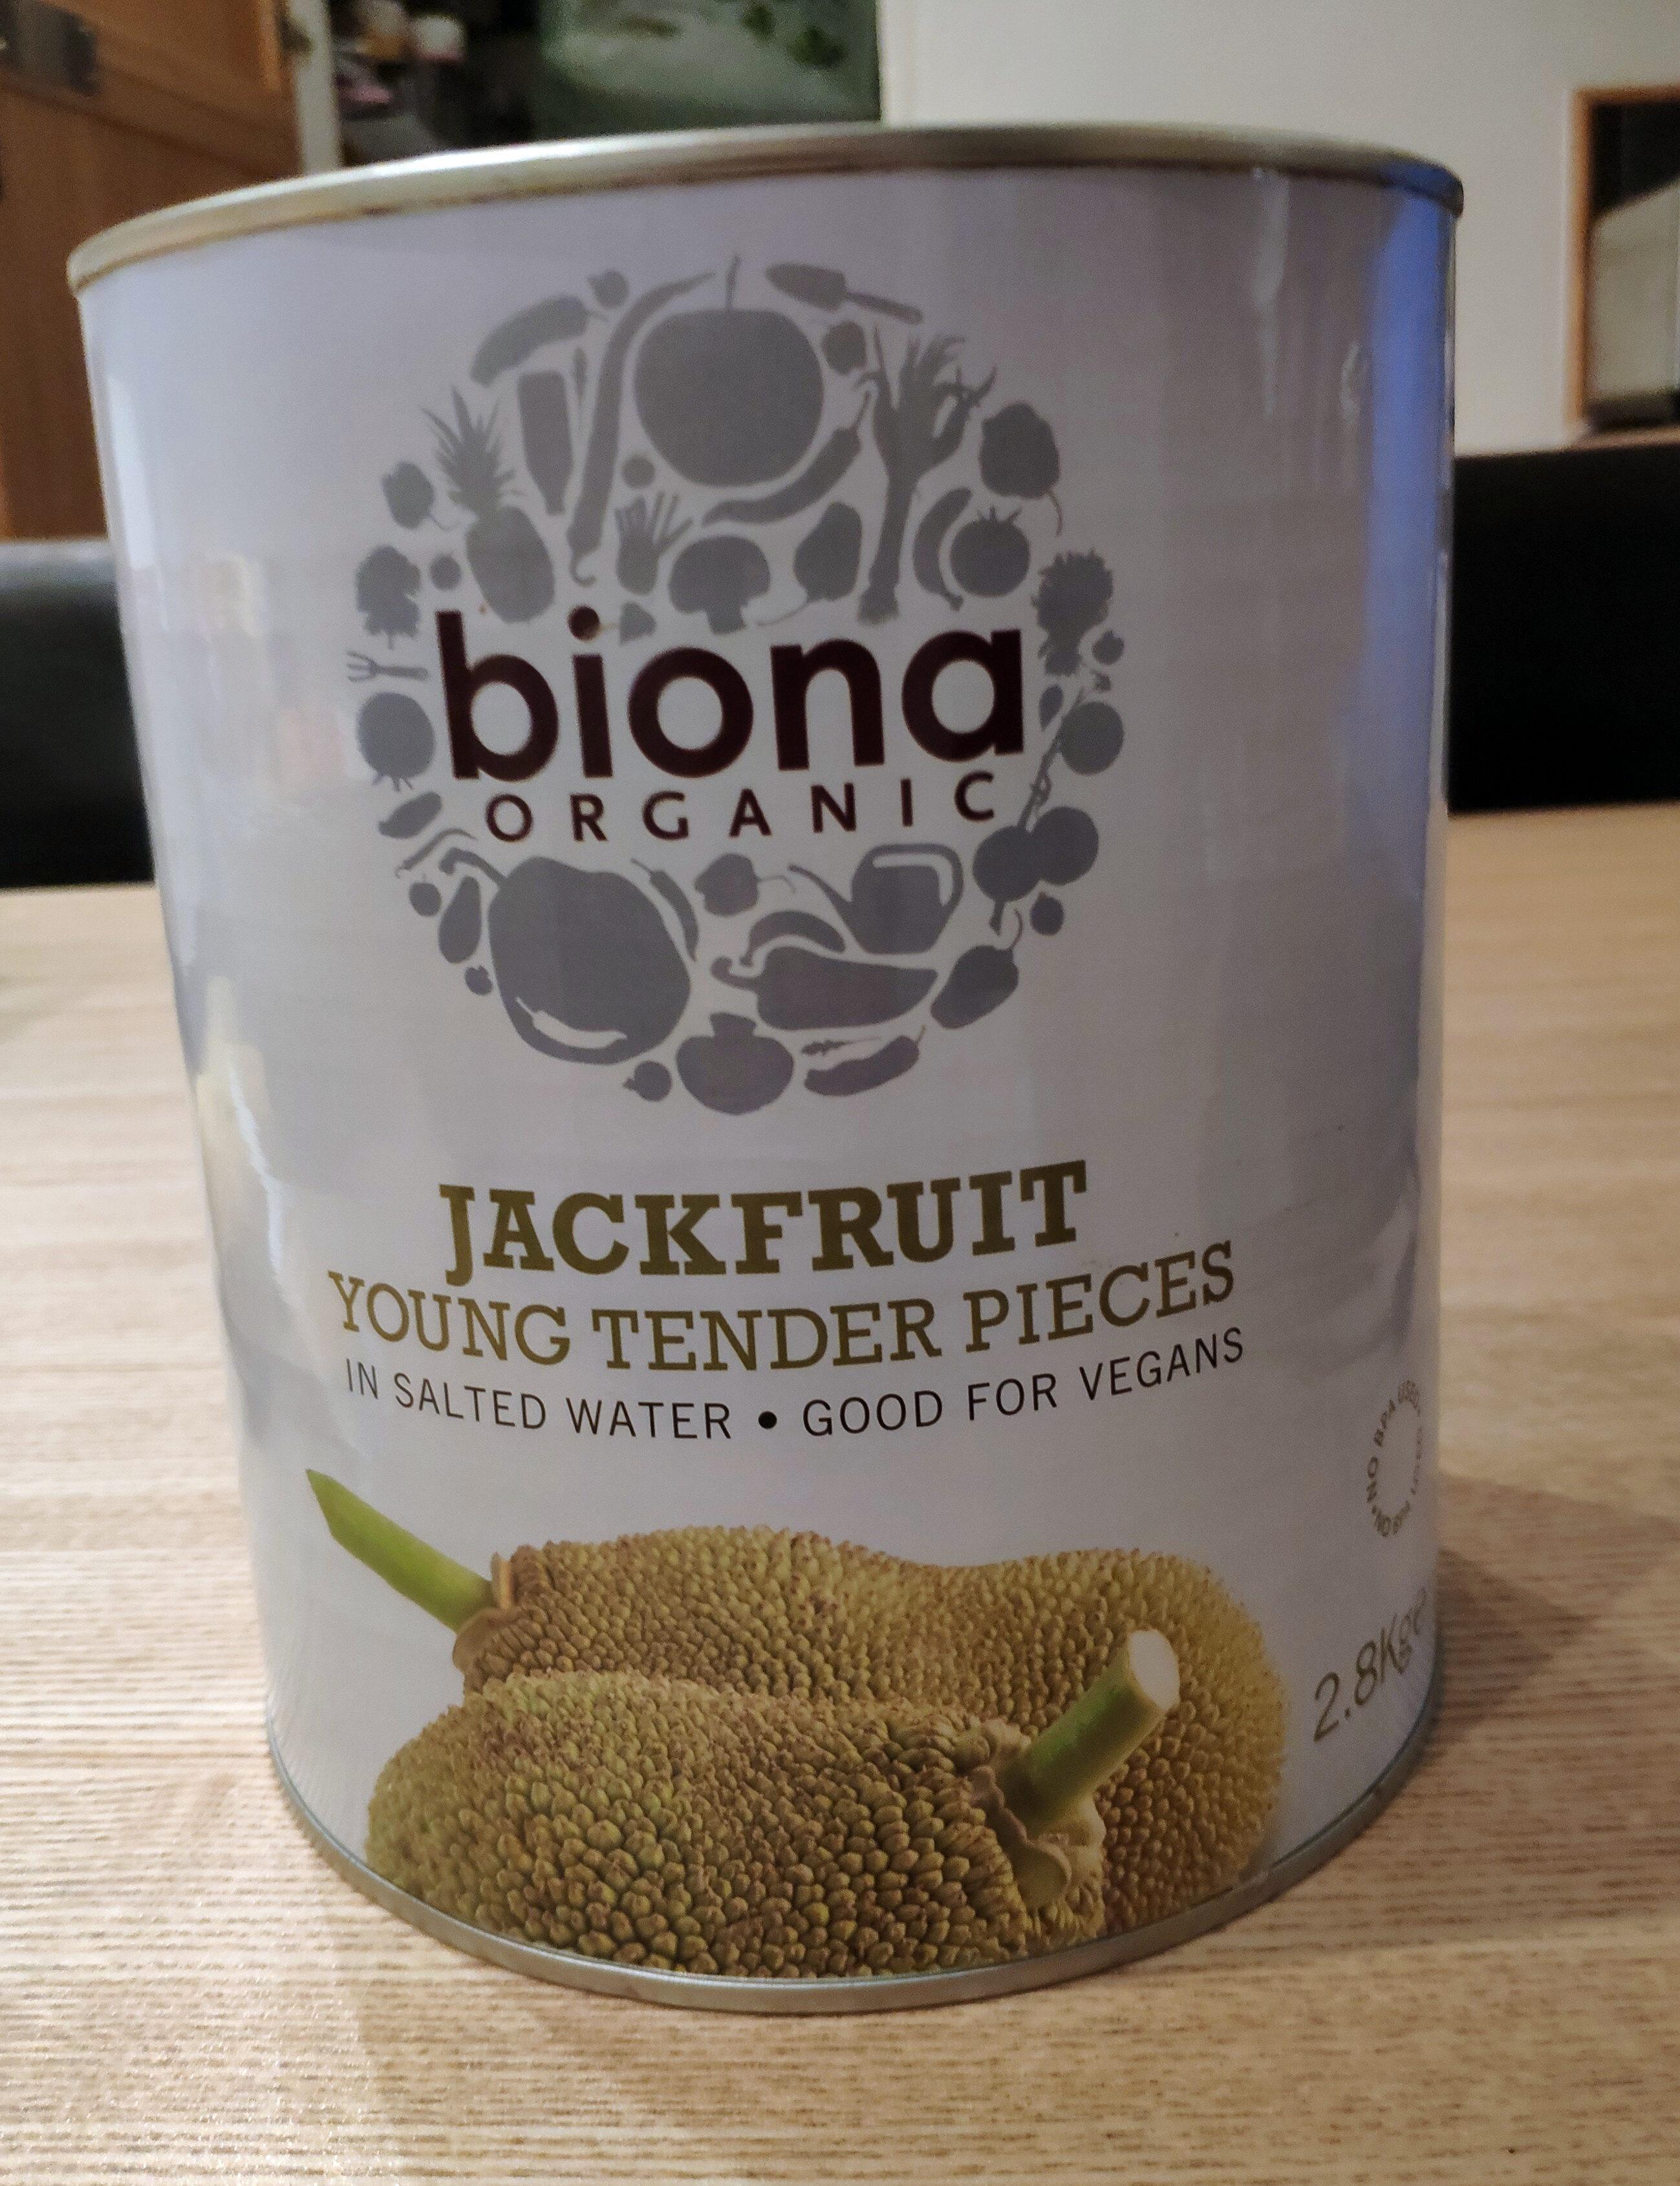 Jackfruit Young Tender Pieces - Product - nl